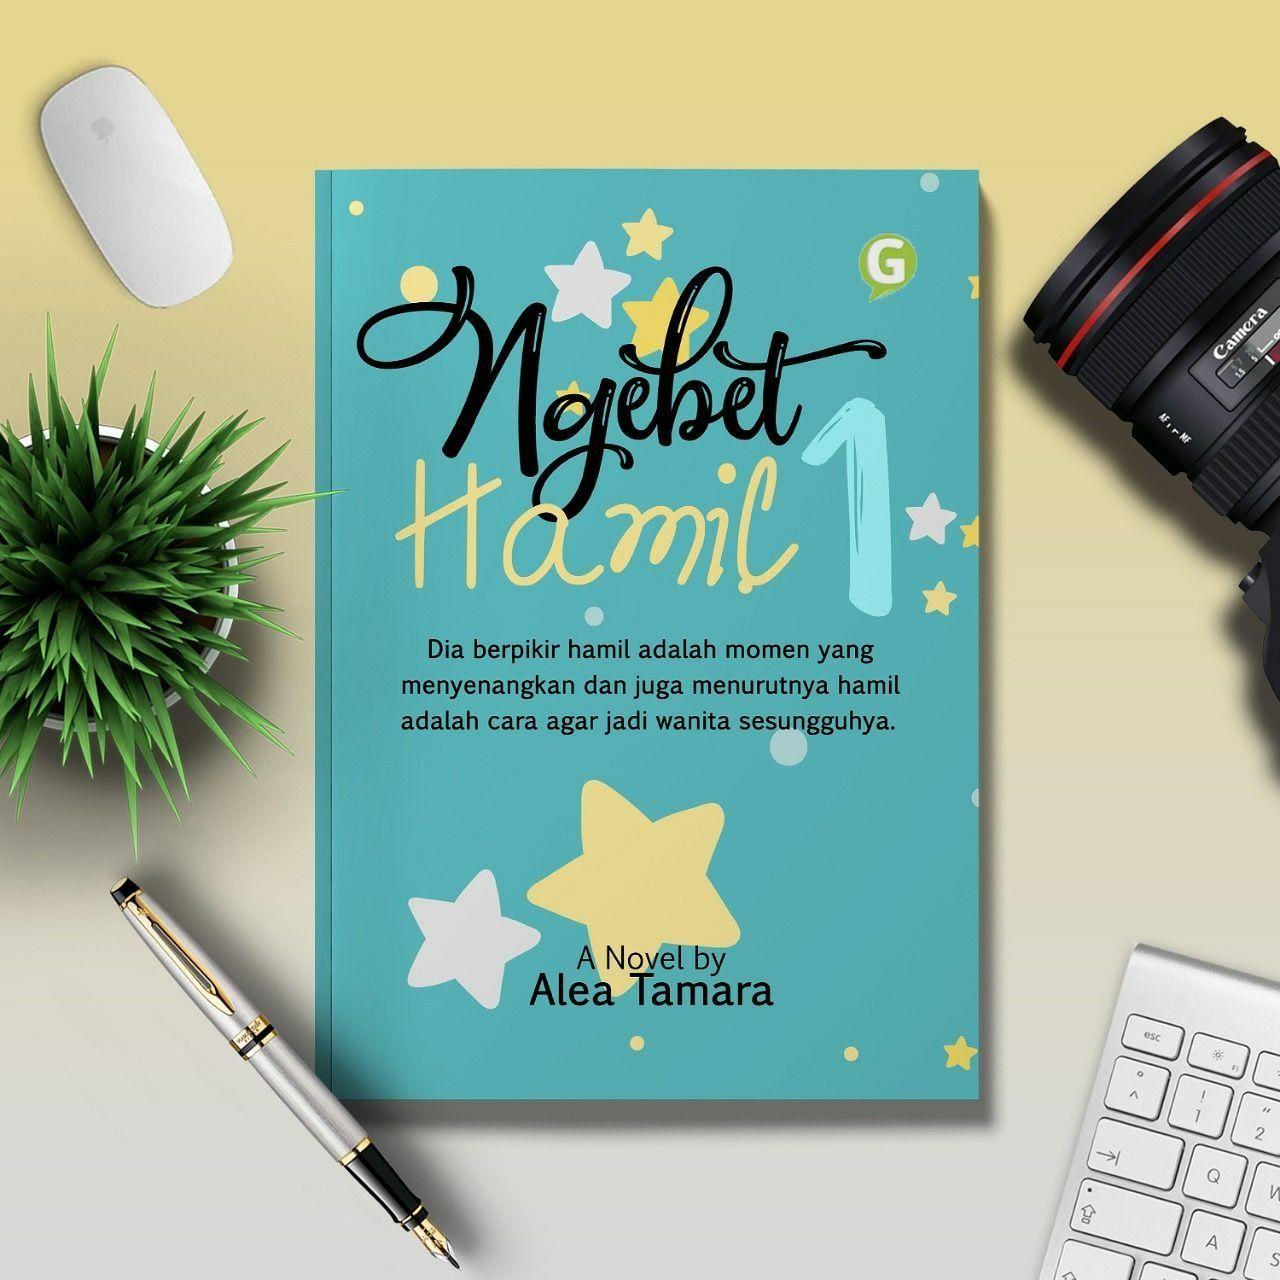 Ngebet Hamil End Sudah Terbit Hamil Novel Wanita